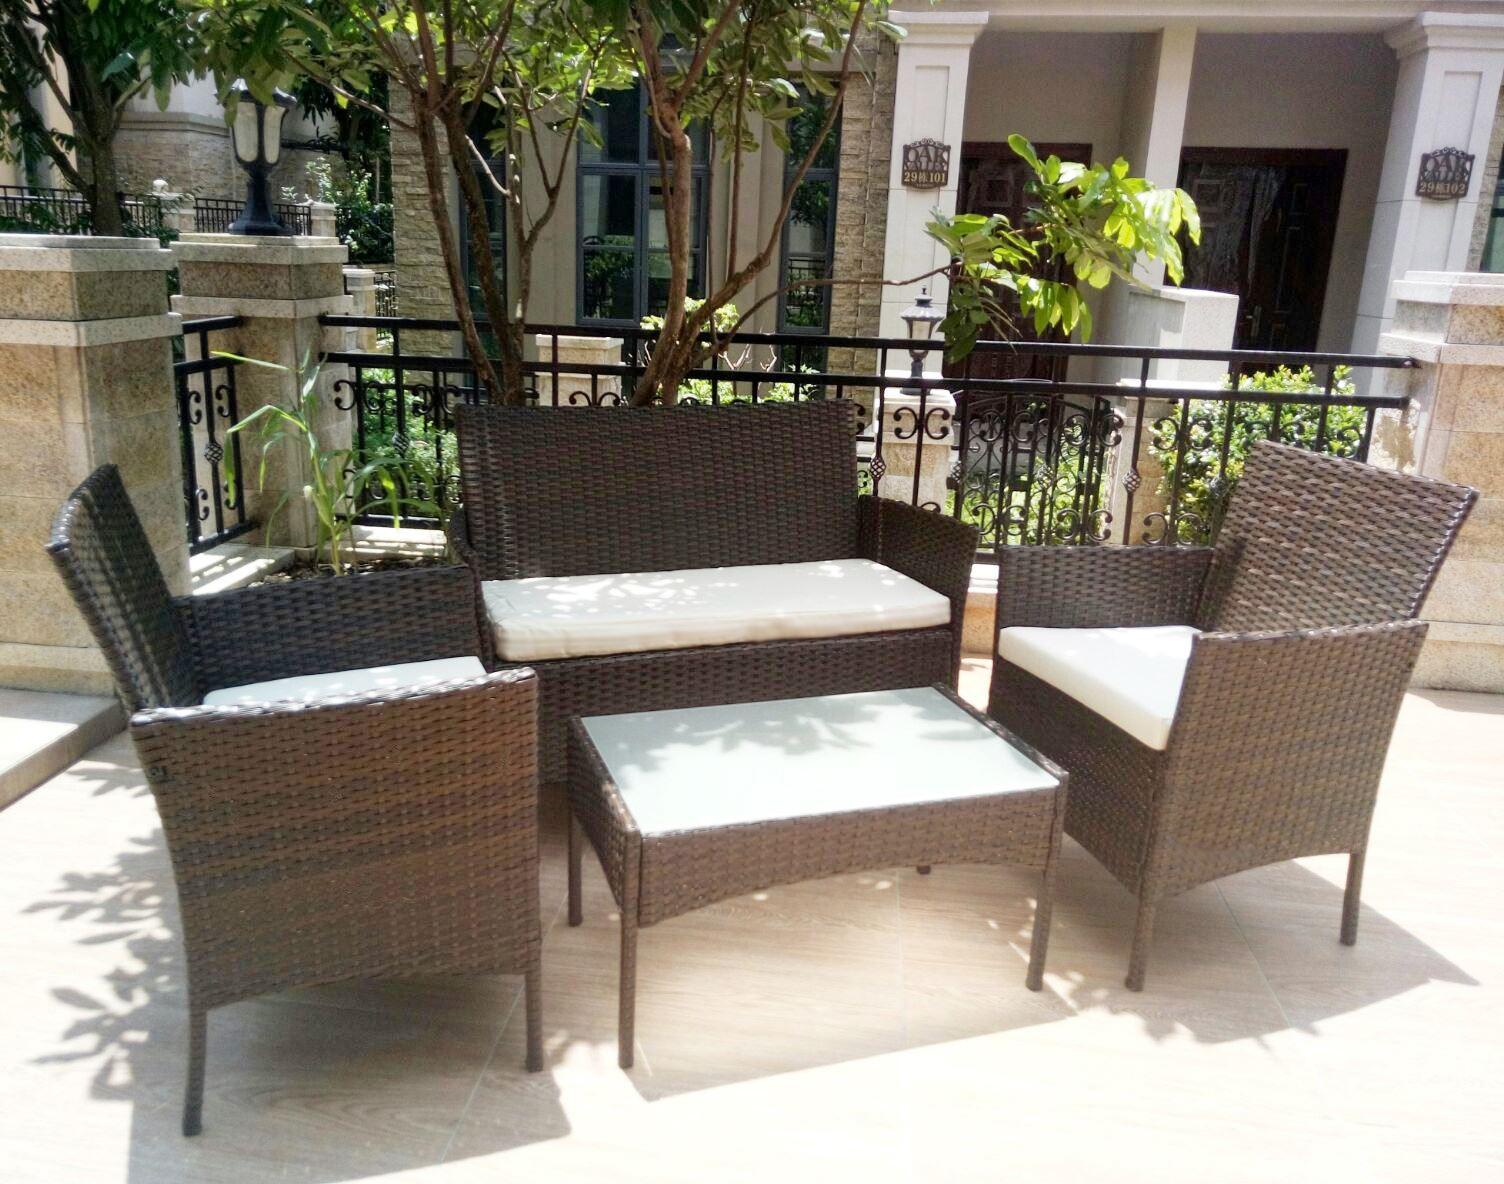 4 Piece Rattan Garden Glass Table Chairs Patio Set Outdoor Garden Furni